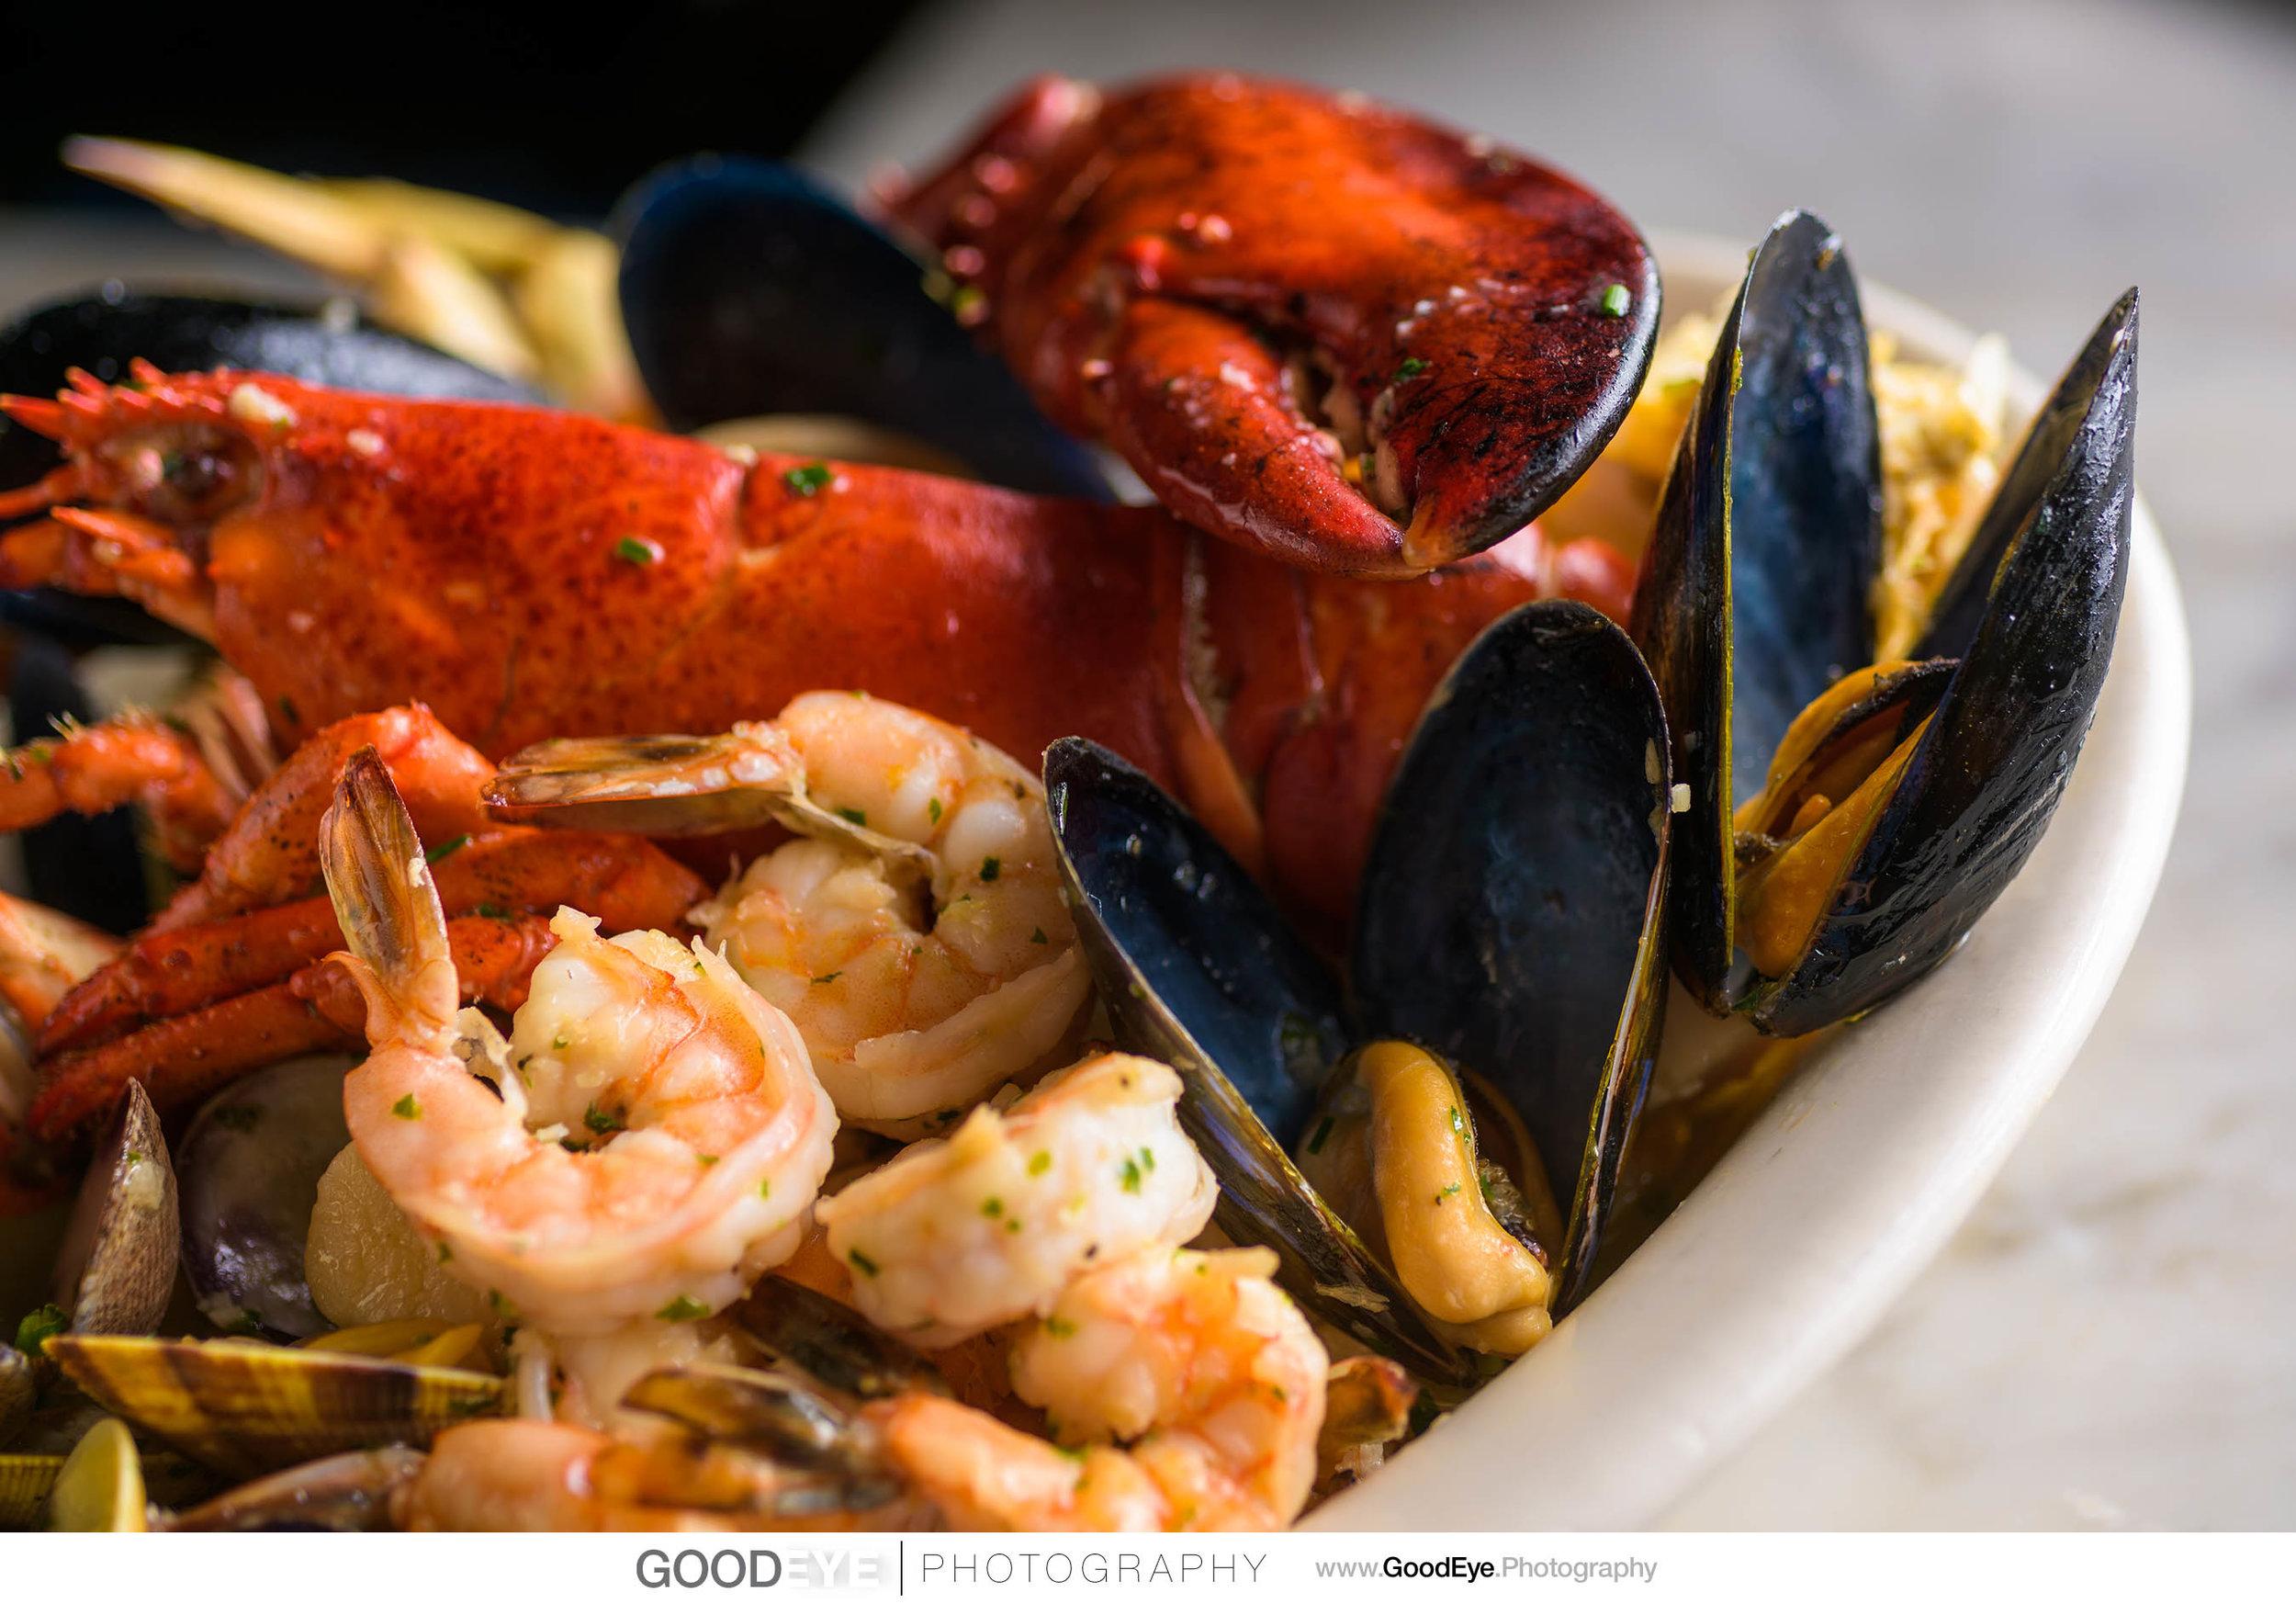 6290_Cafe_8_Aliotos_San_Francisco_Food_Photography_web.jpg